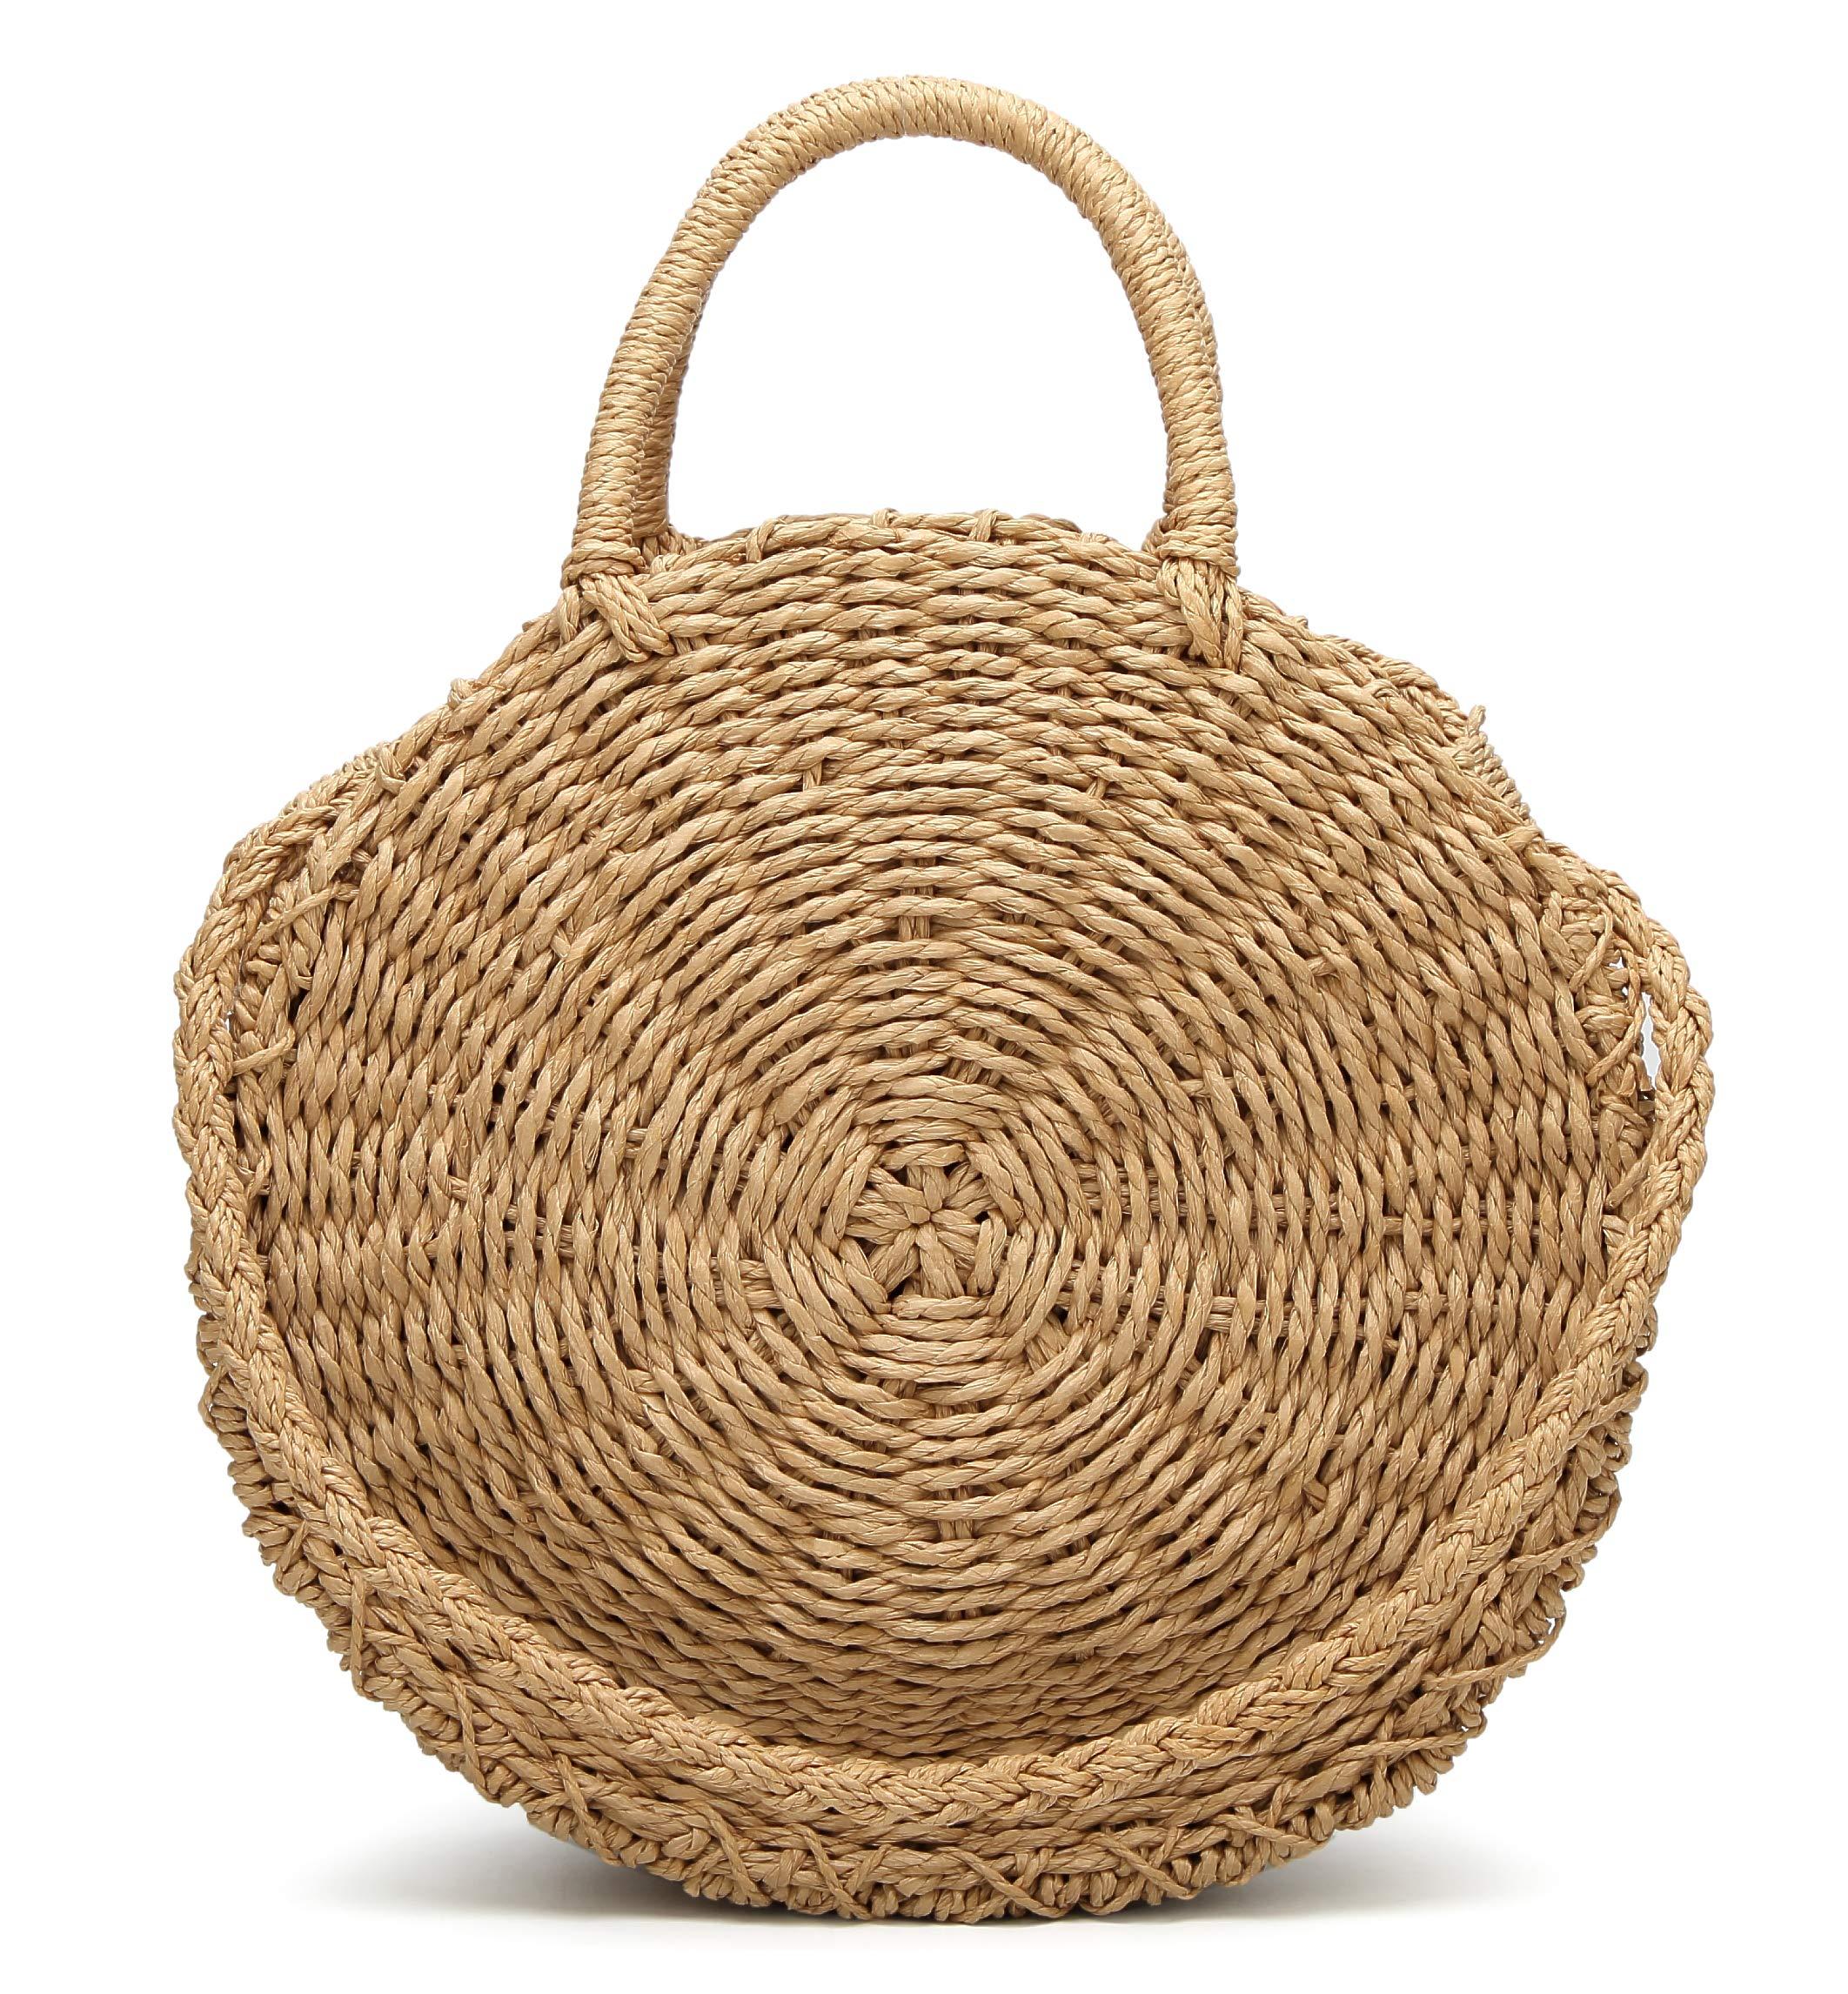 Obosoyo Straw Crossbody Bag Women Weave Shoulder Bag Round Summer Beach Sea Tote Handbags Lightbrown-Large